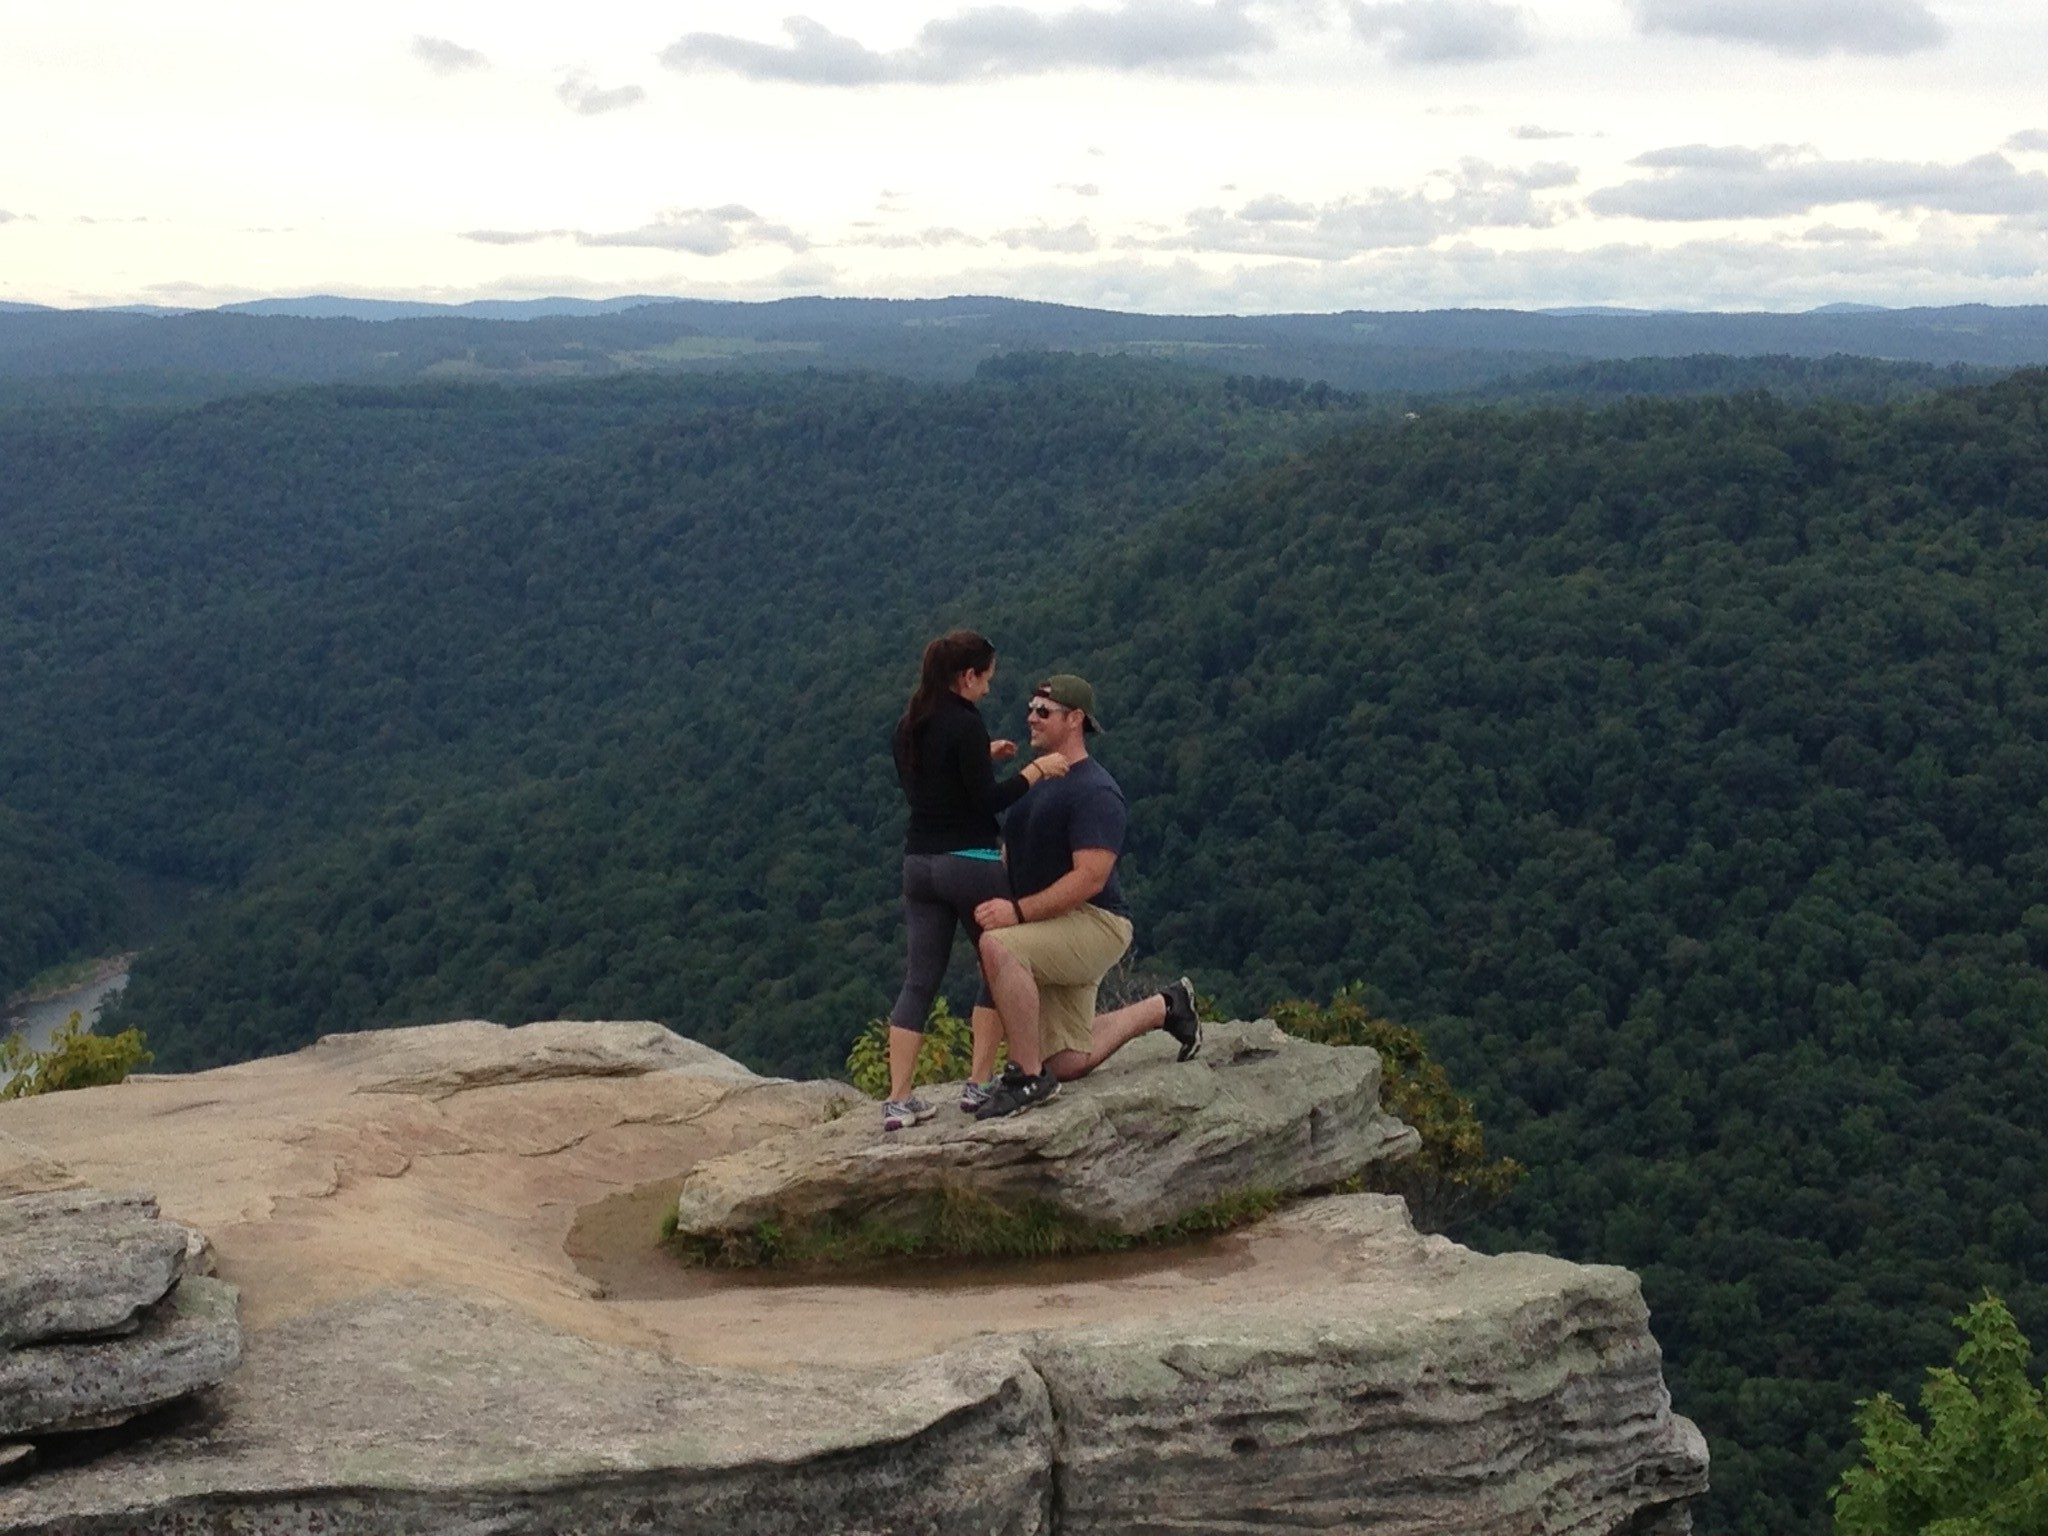 Image 5 of Patrick and Kara's West Virginia Mountain Proposal